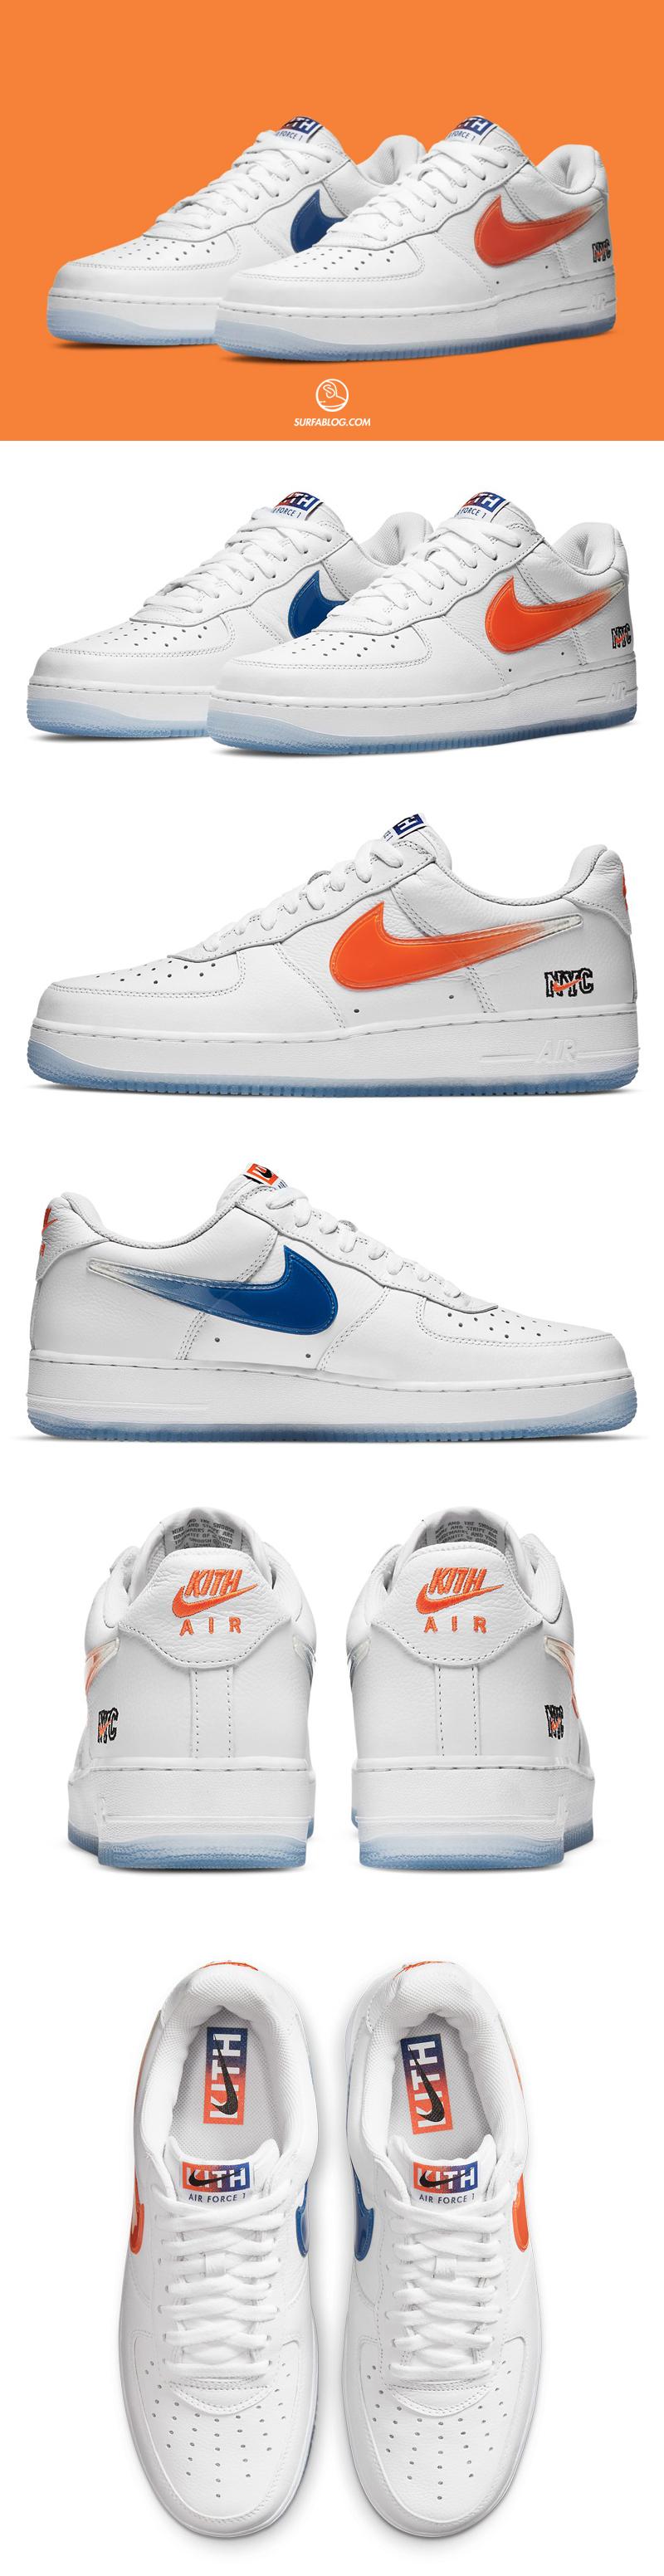 air force 1 arancioni e blu